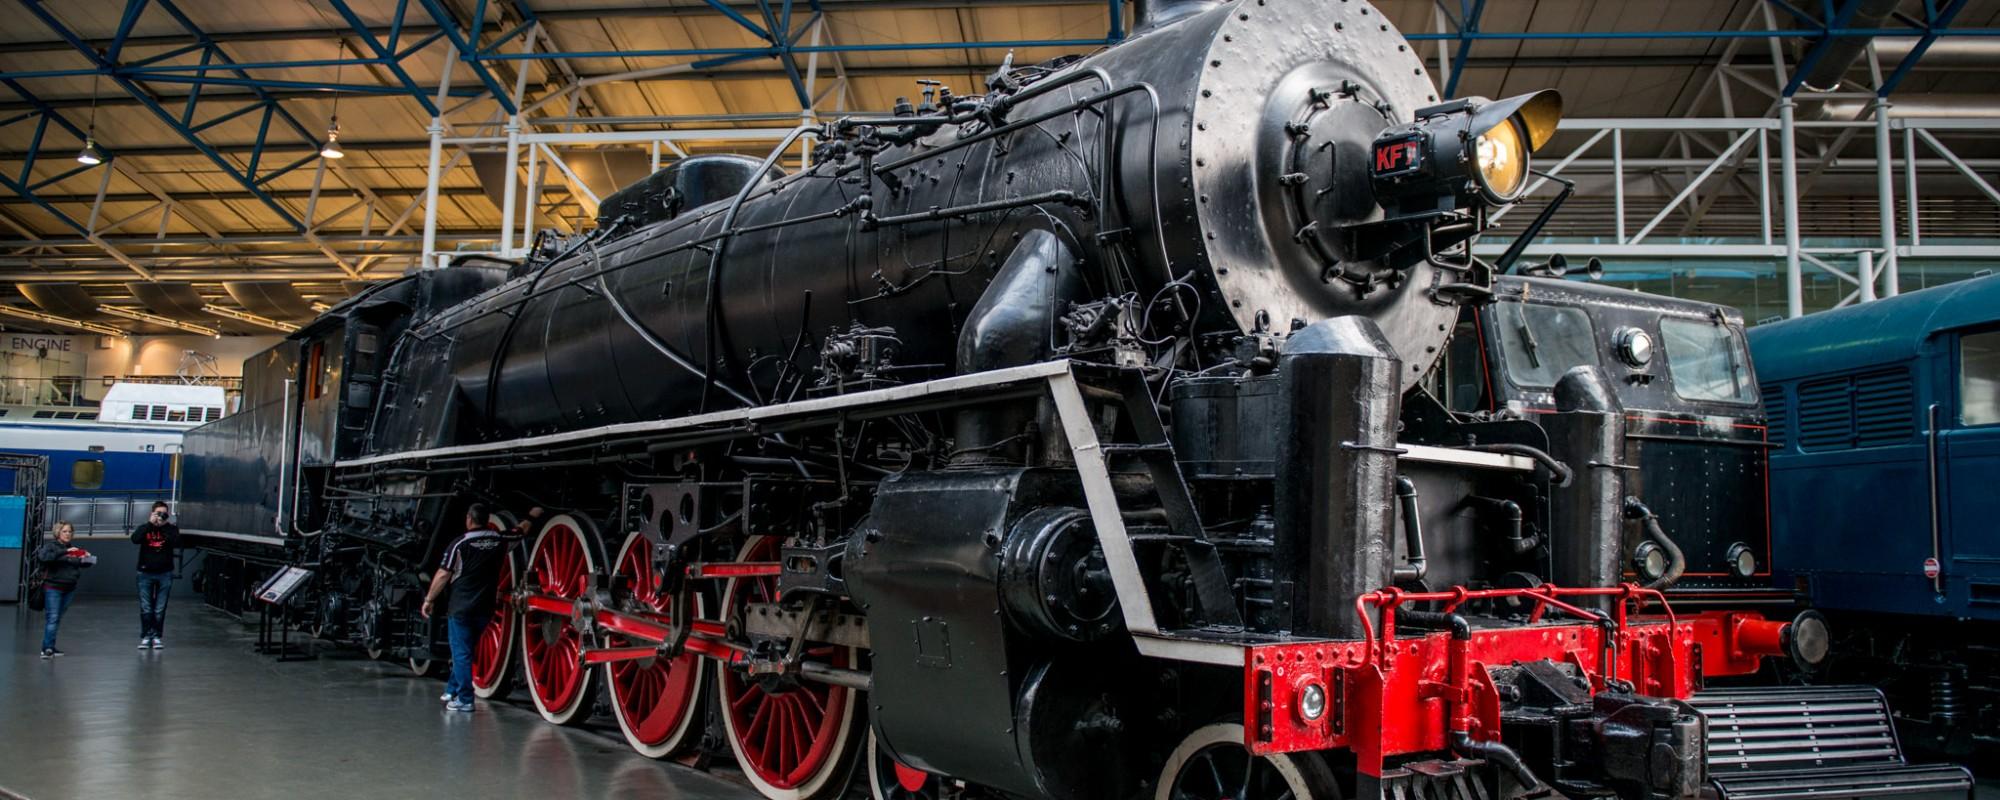 Chinese Government Railways Steam Locomotive 4-8-4 KF Class No 7